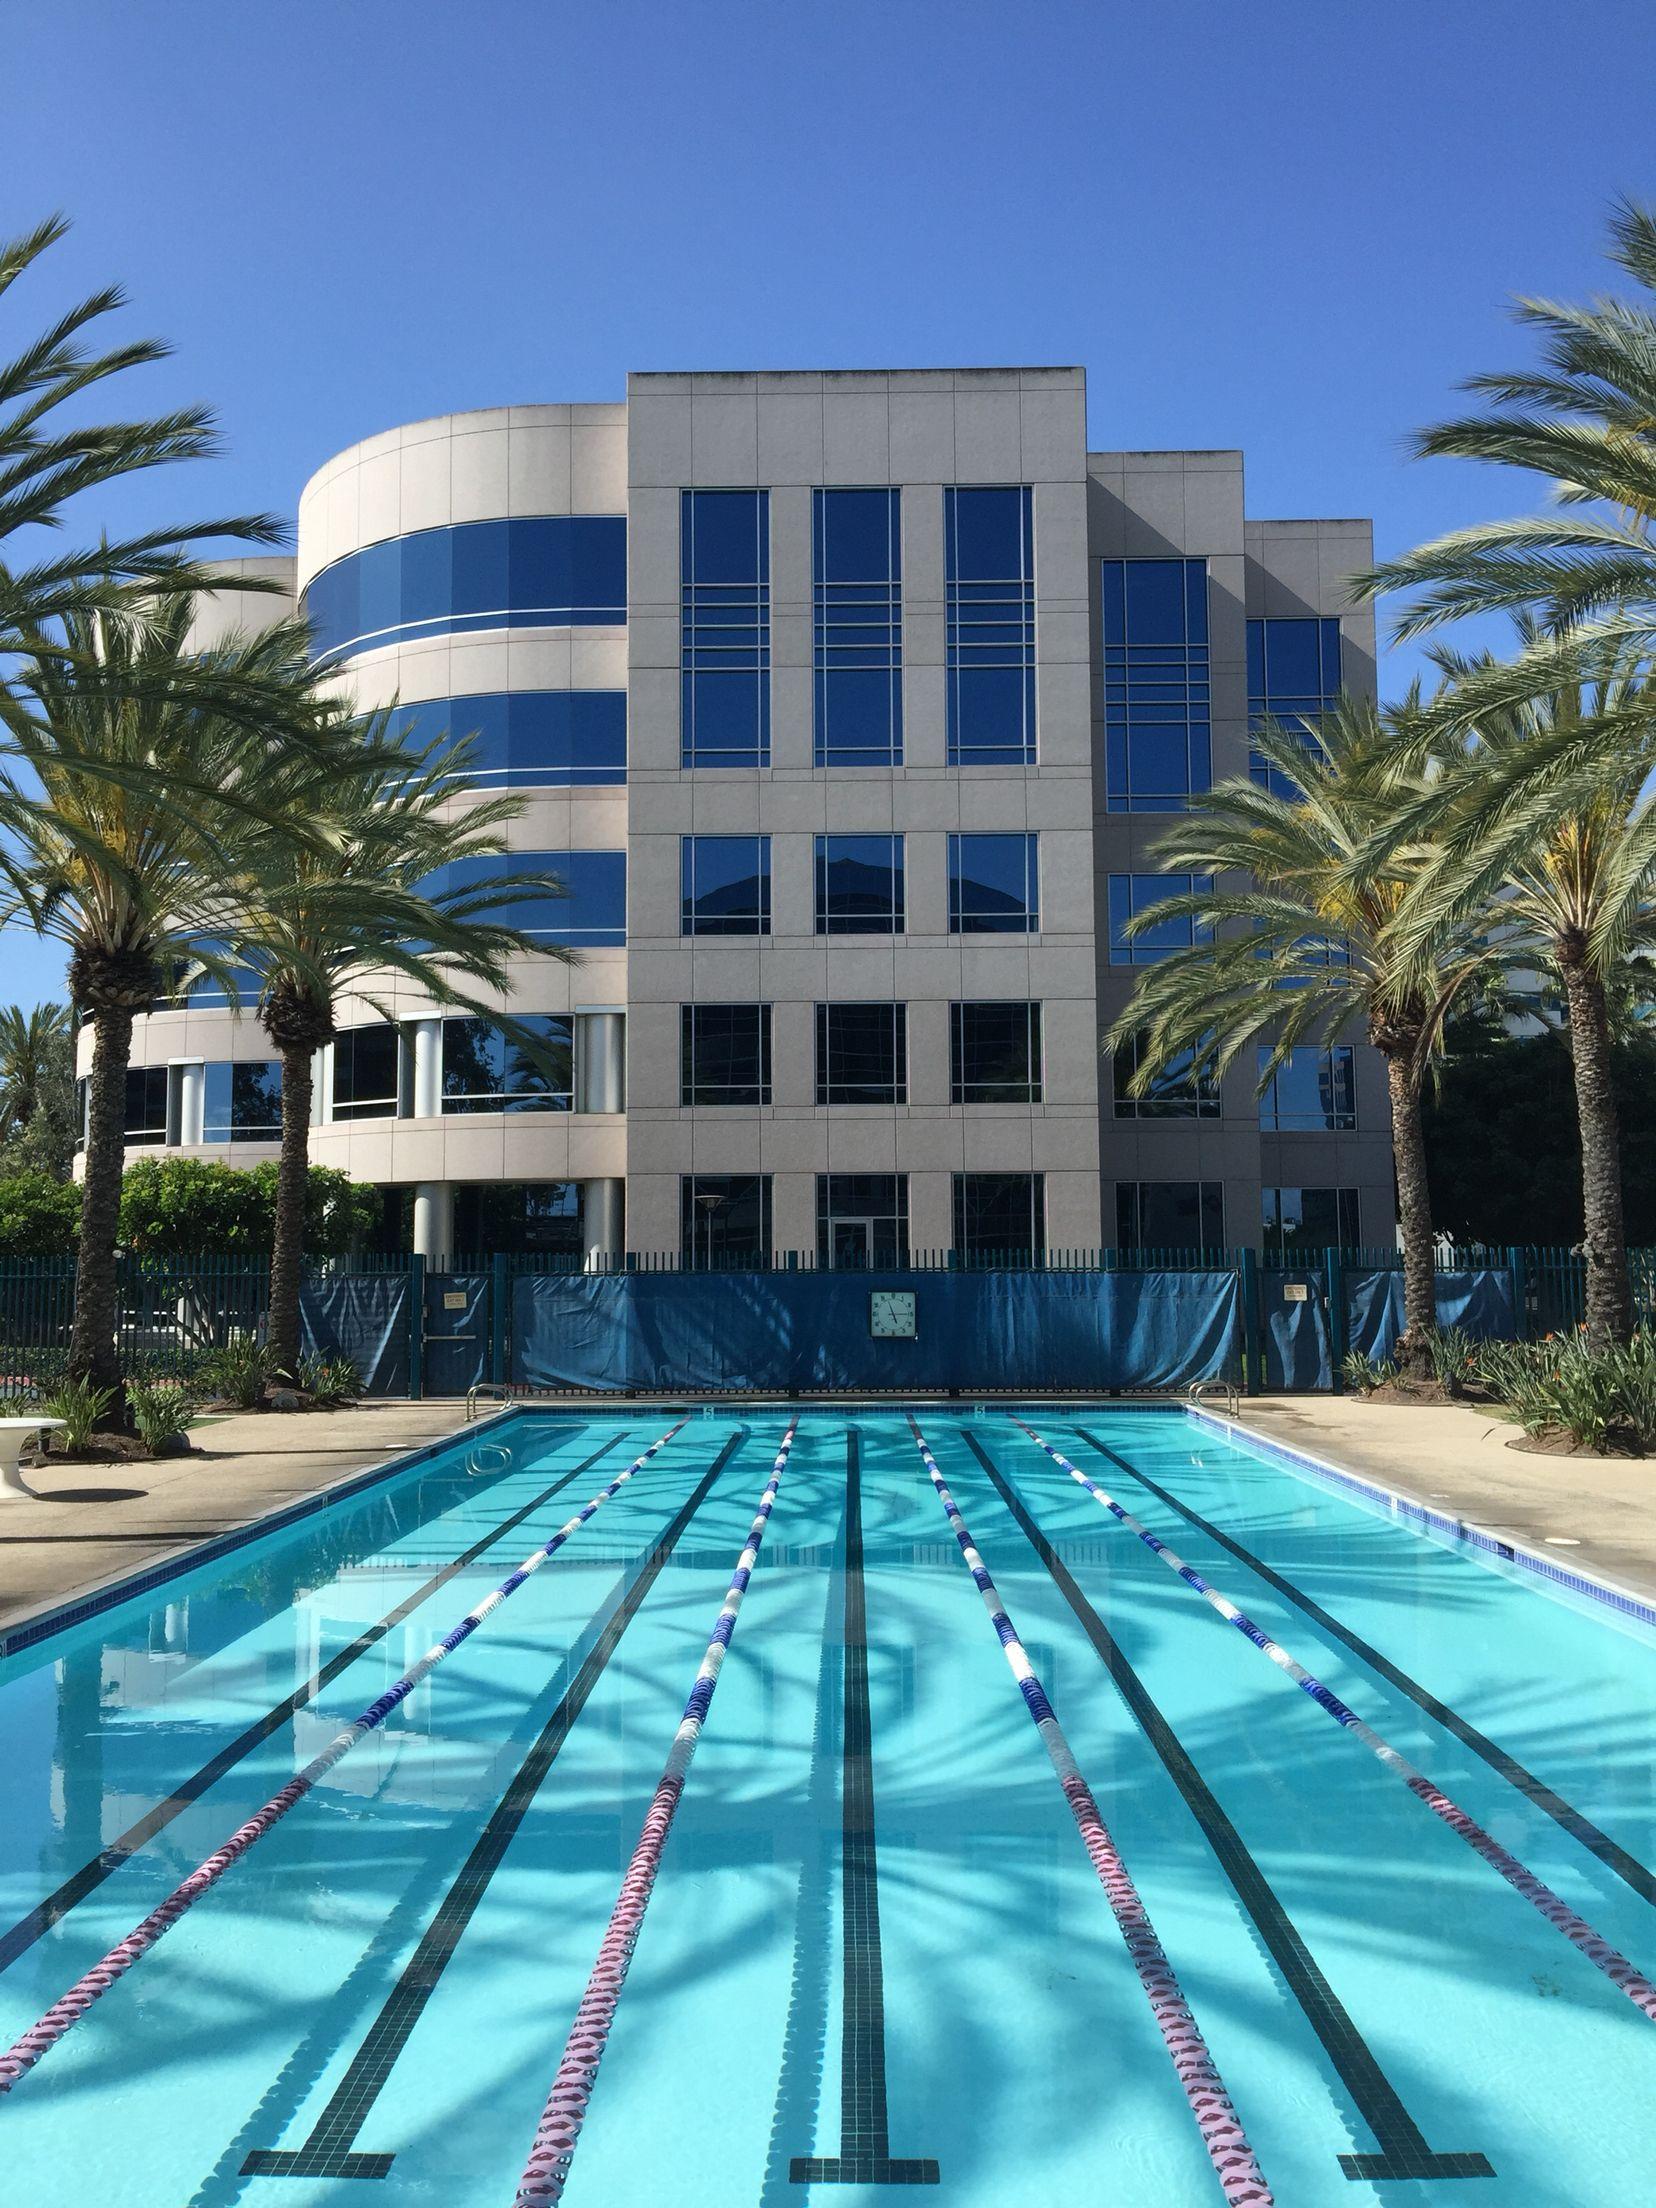 Pool At 24 Hour Fitness Ultra Sport Irvine CA Irvine CA Sports Tennis Outdoor Decor